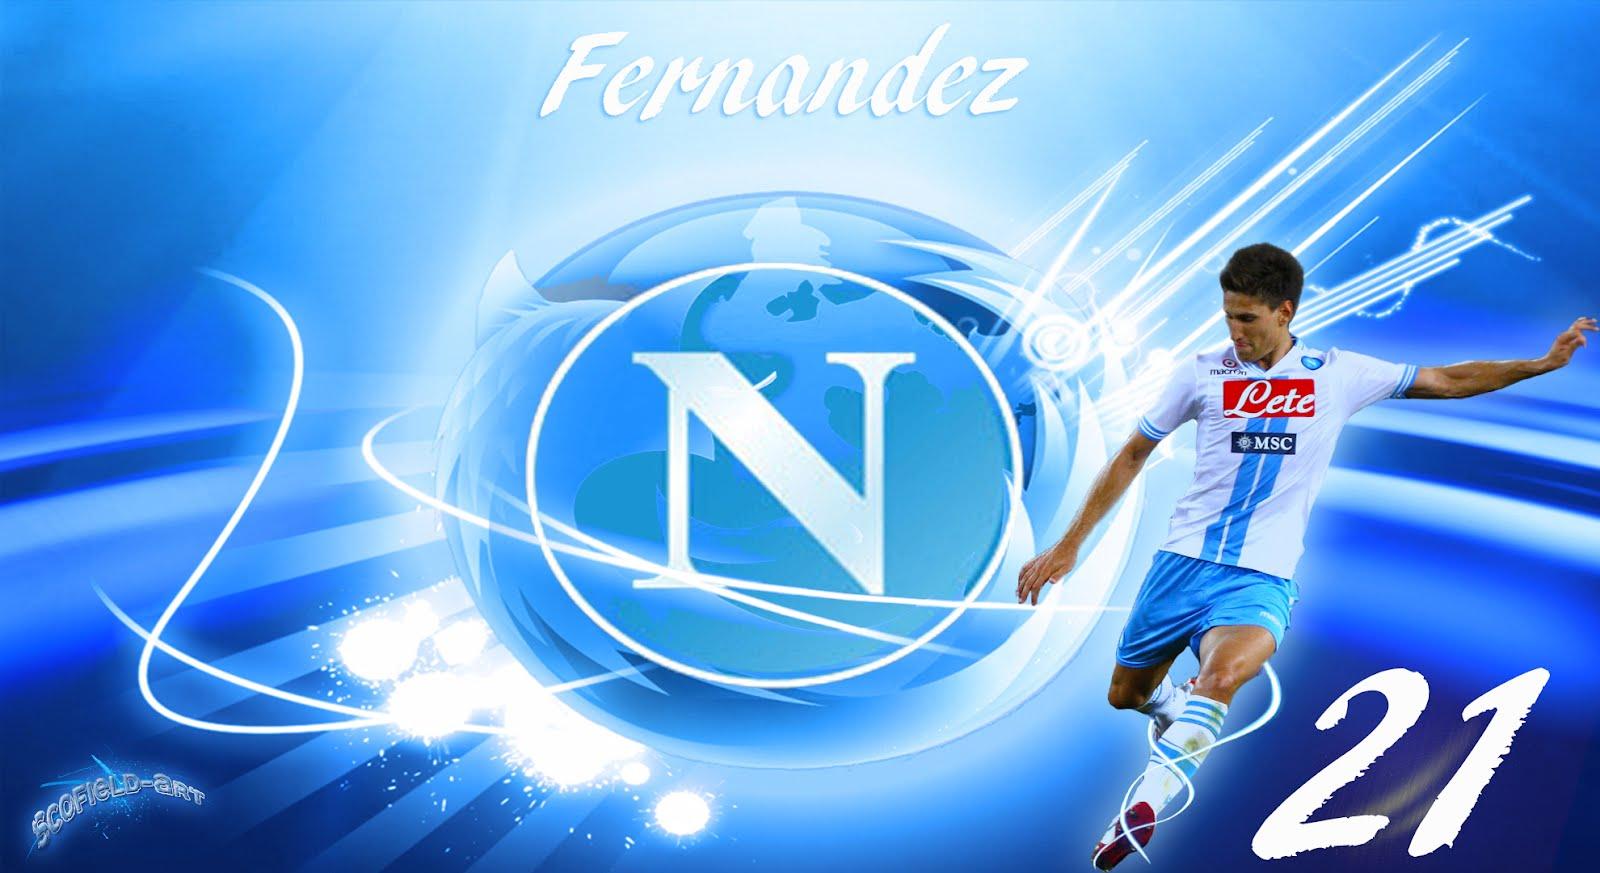 calcio hd wallpapers - photo #42